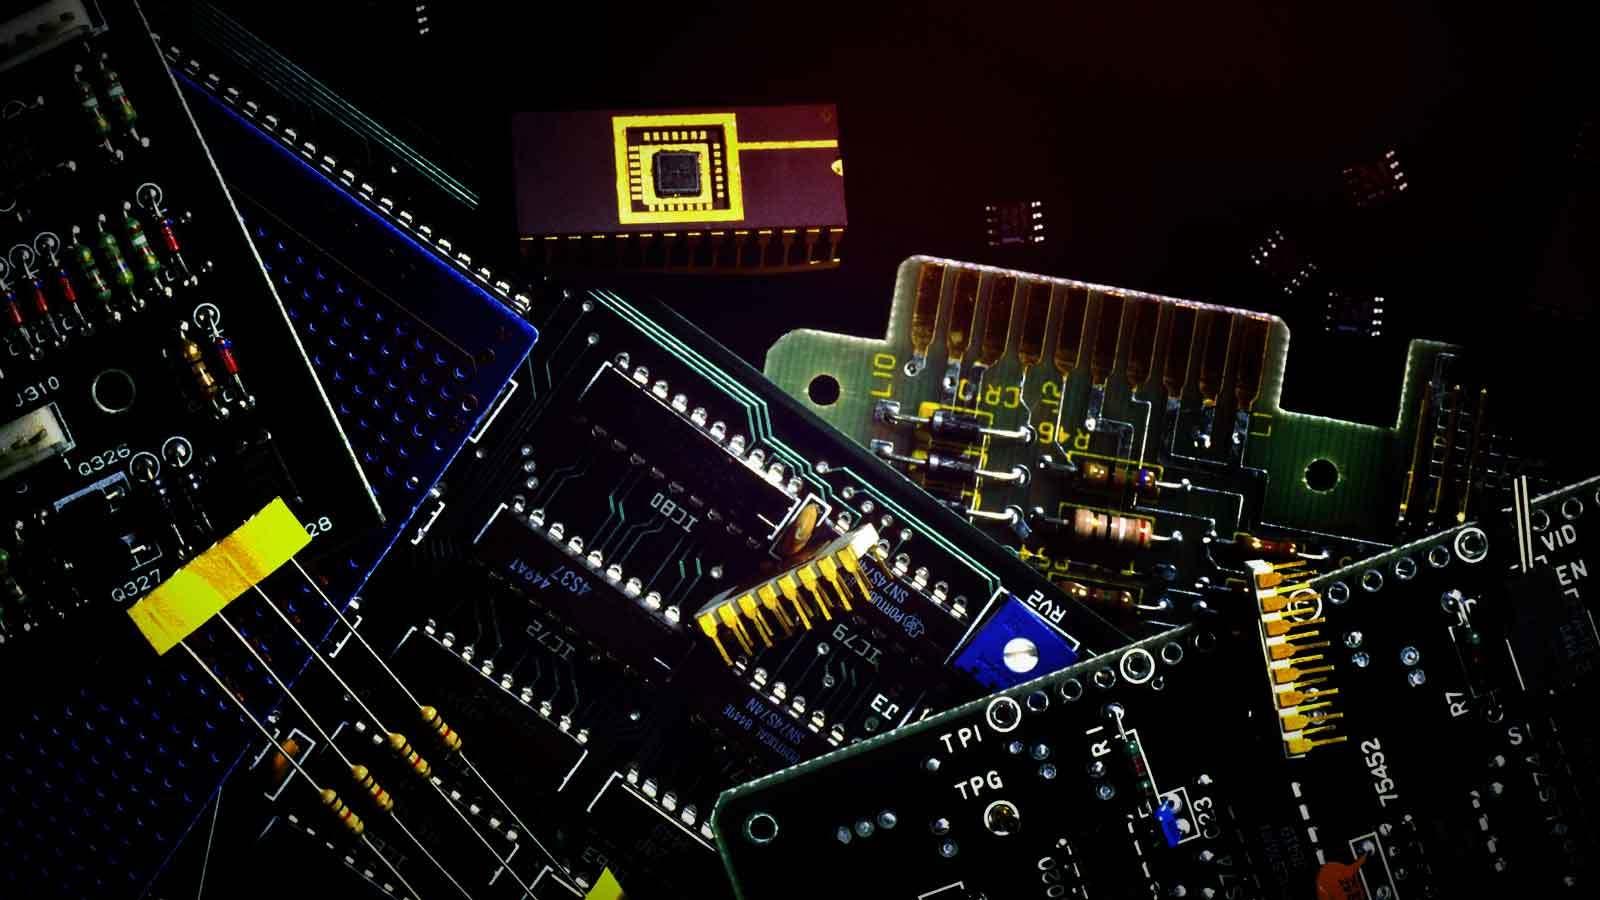 elektronisia komponentteja